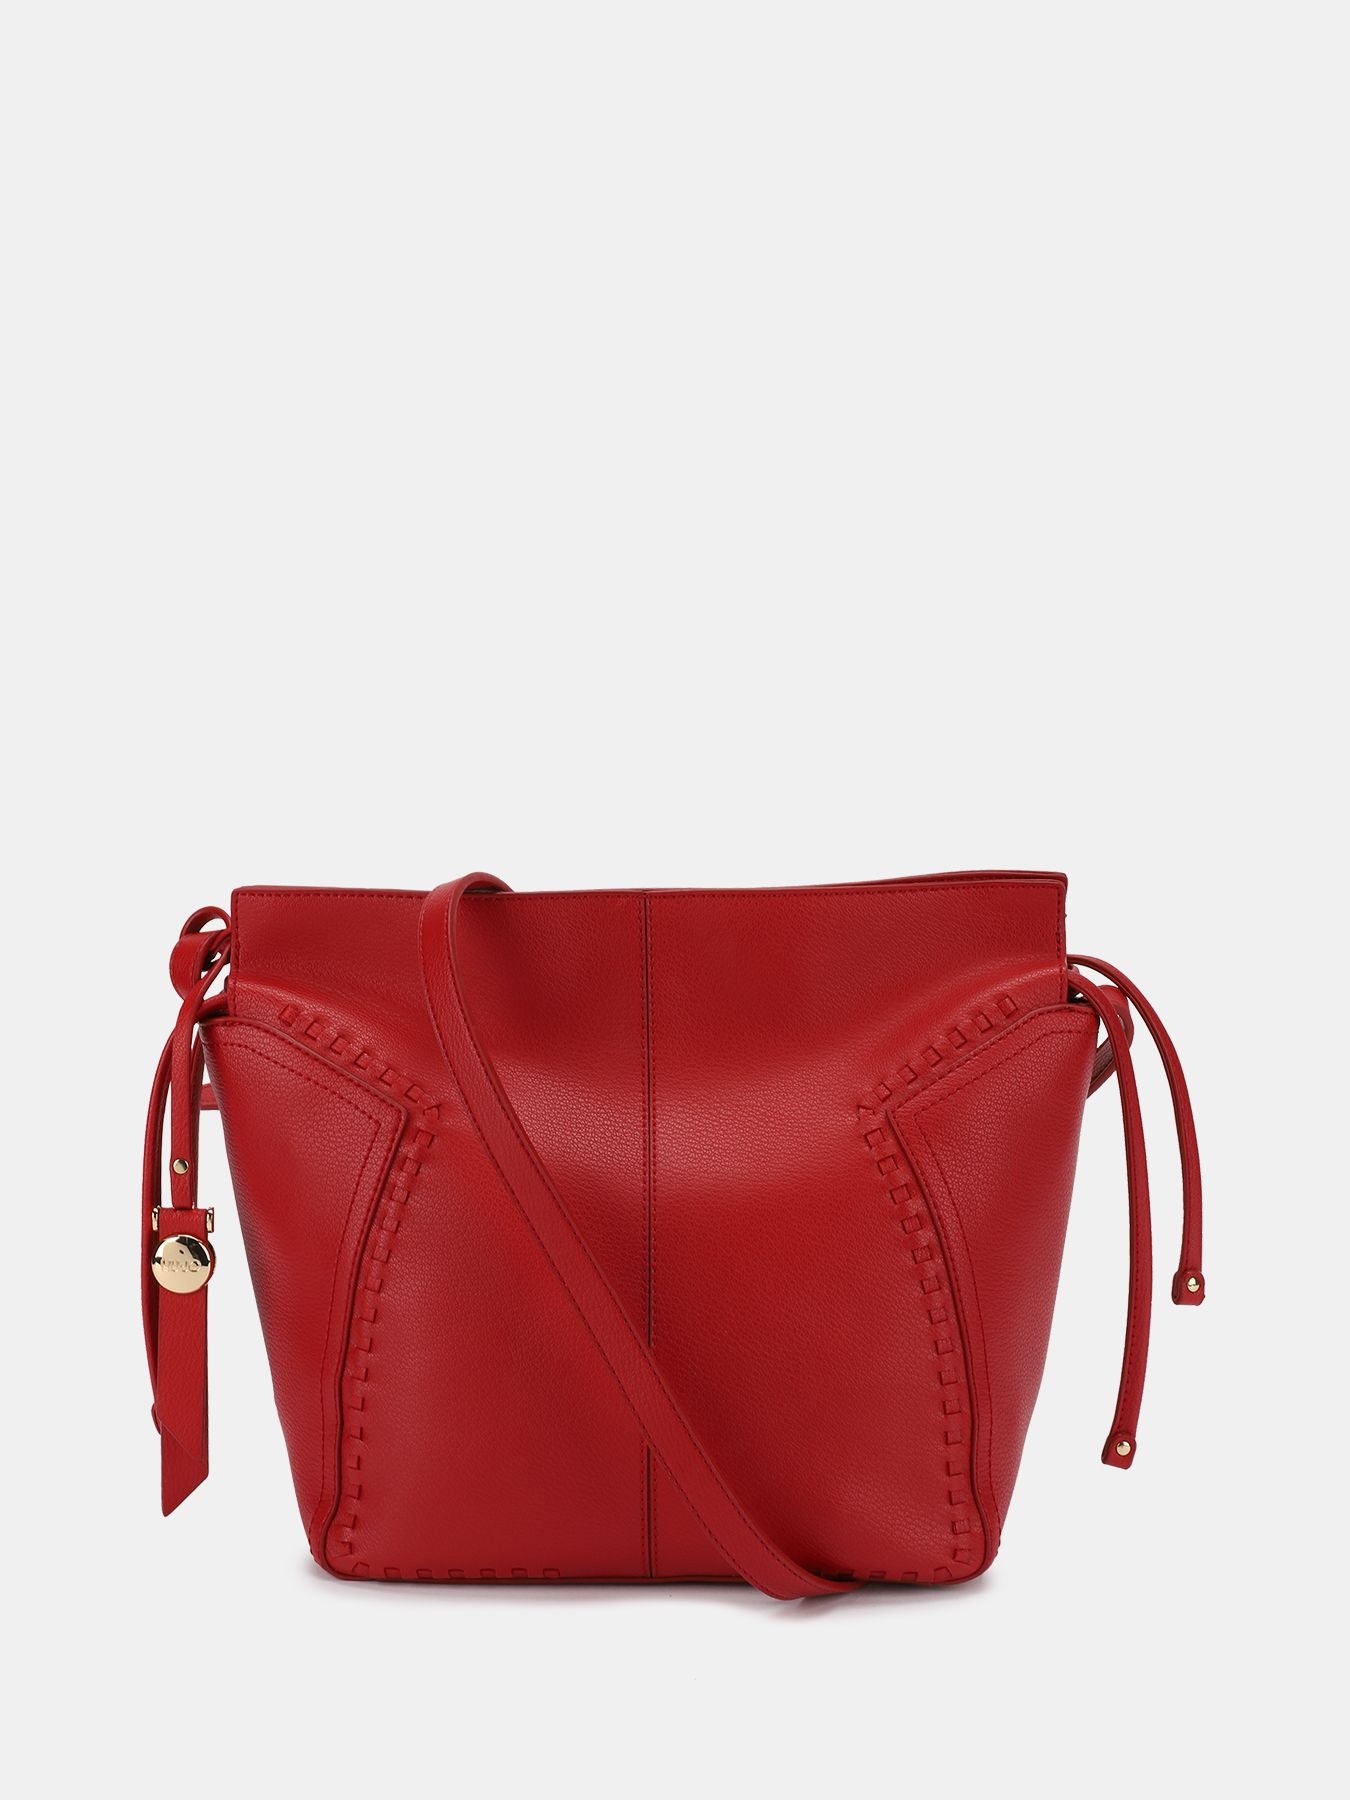 Liu Jo Женская сумка 338725-185 Фото 5